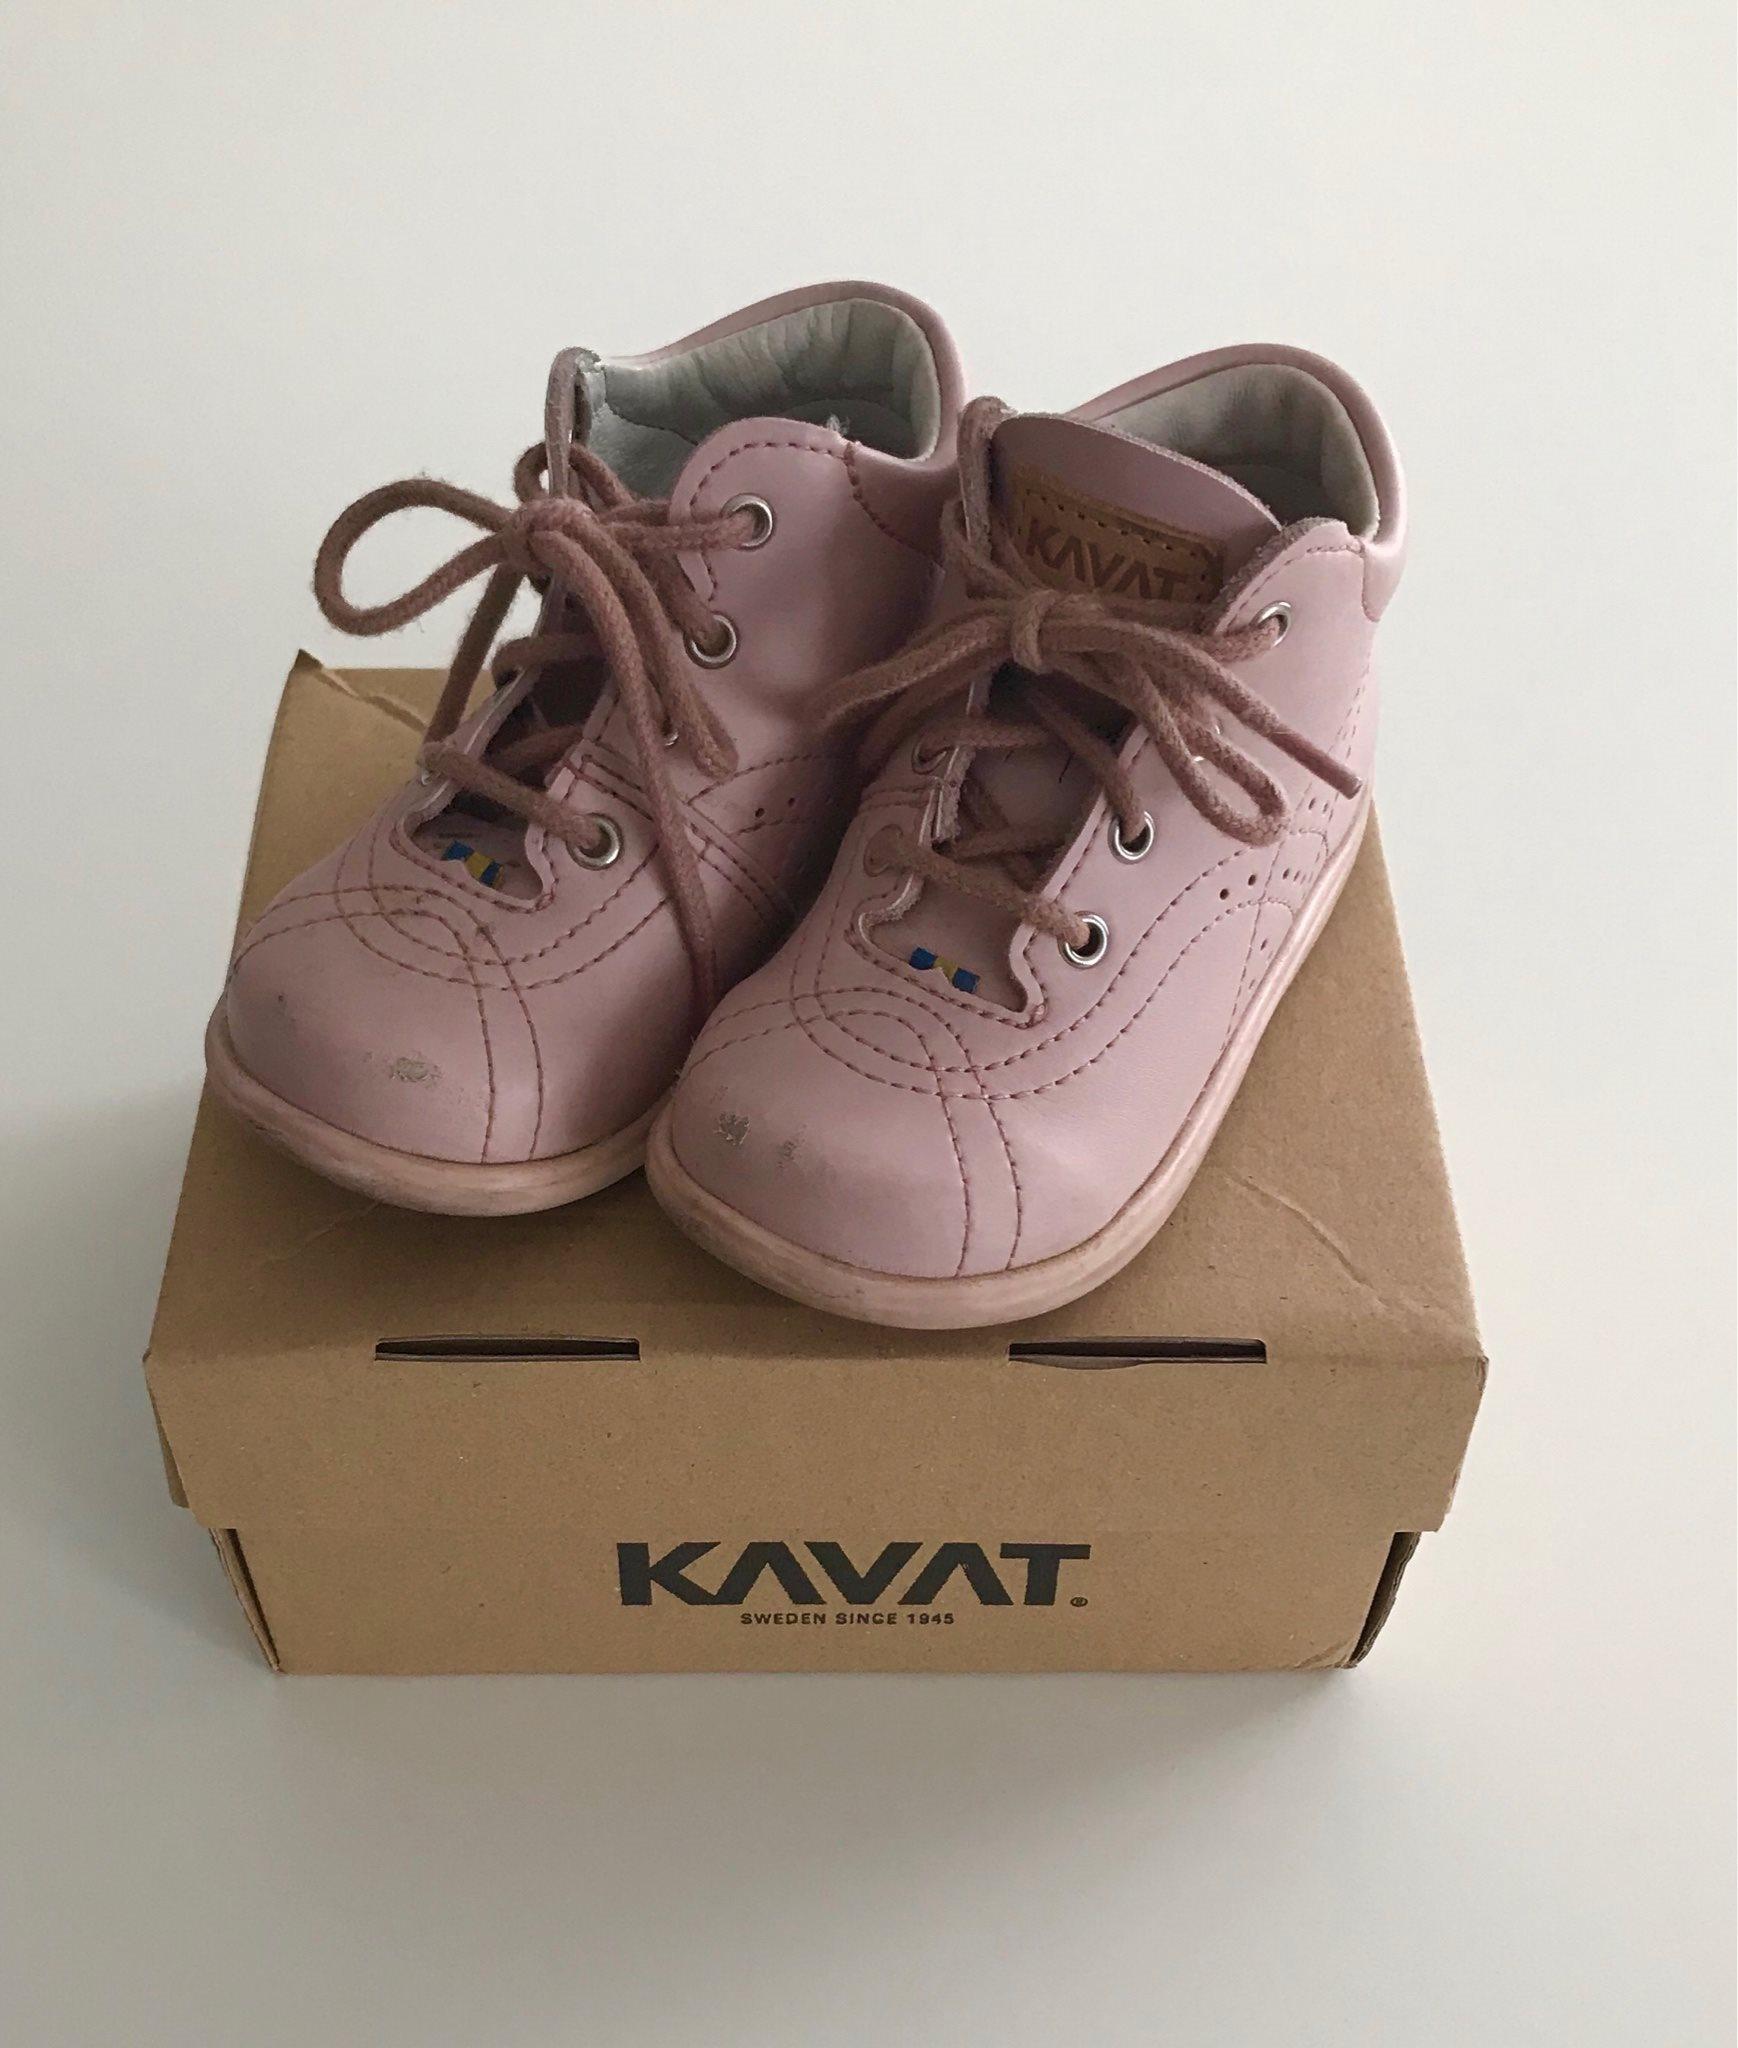 Kavat Edsbro XC strl. 22 lära-gå skor sneakers (329312071) ᐈ Köp på ... 610824e20e73c